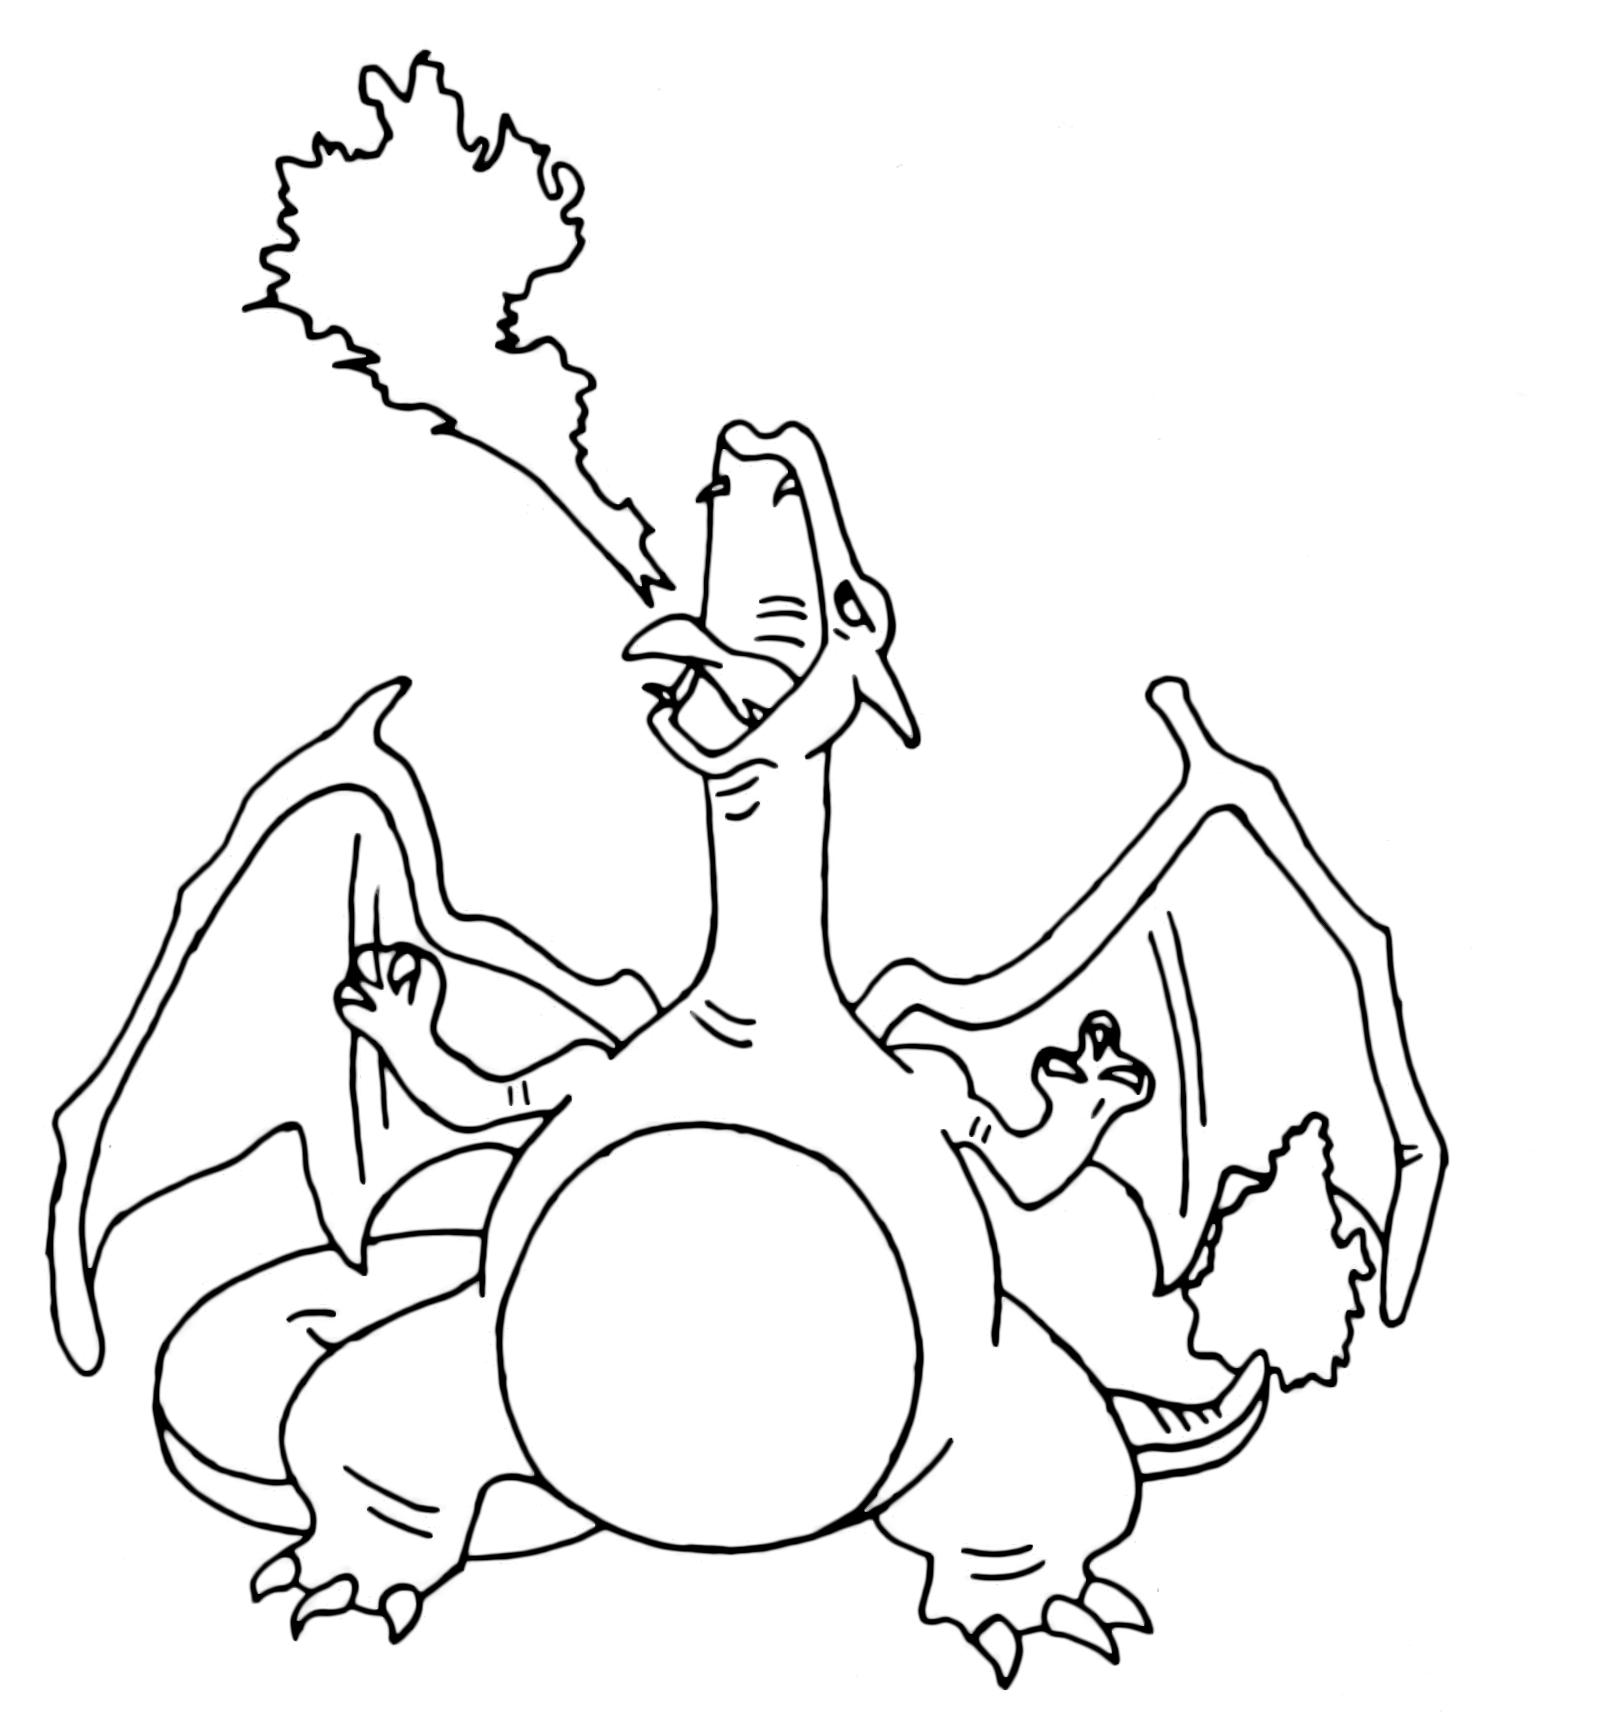 Pokémon Gen 1 Charizard Sputa Fuoco 6 Fuoco